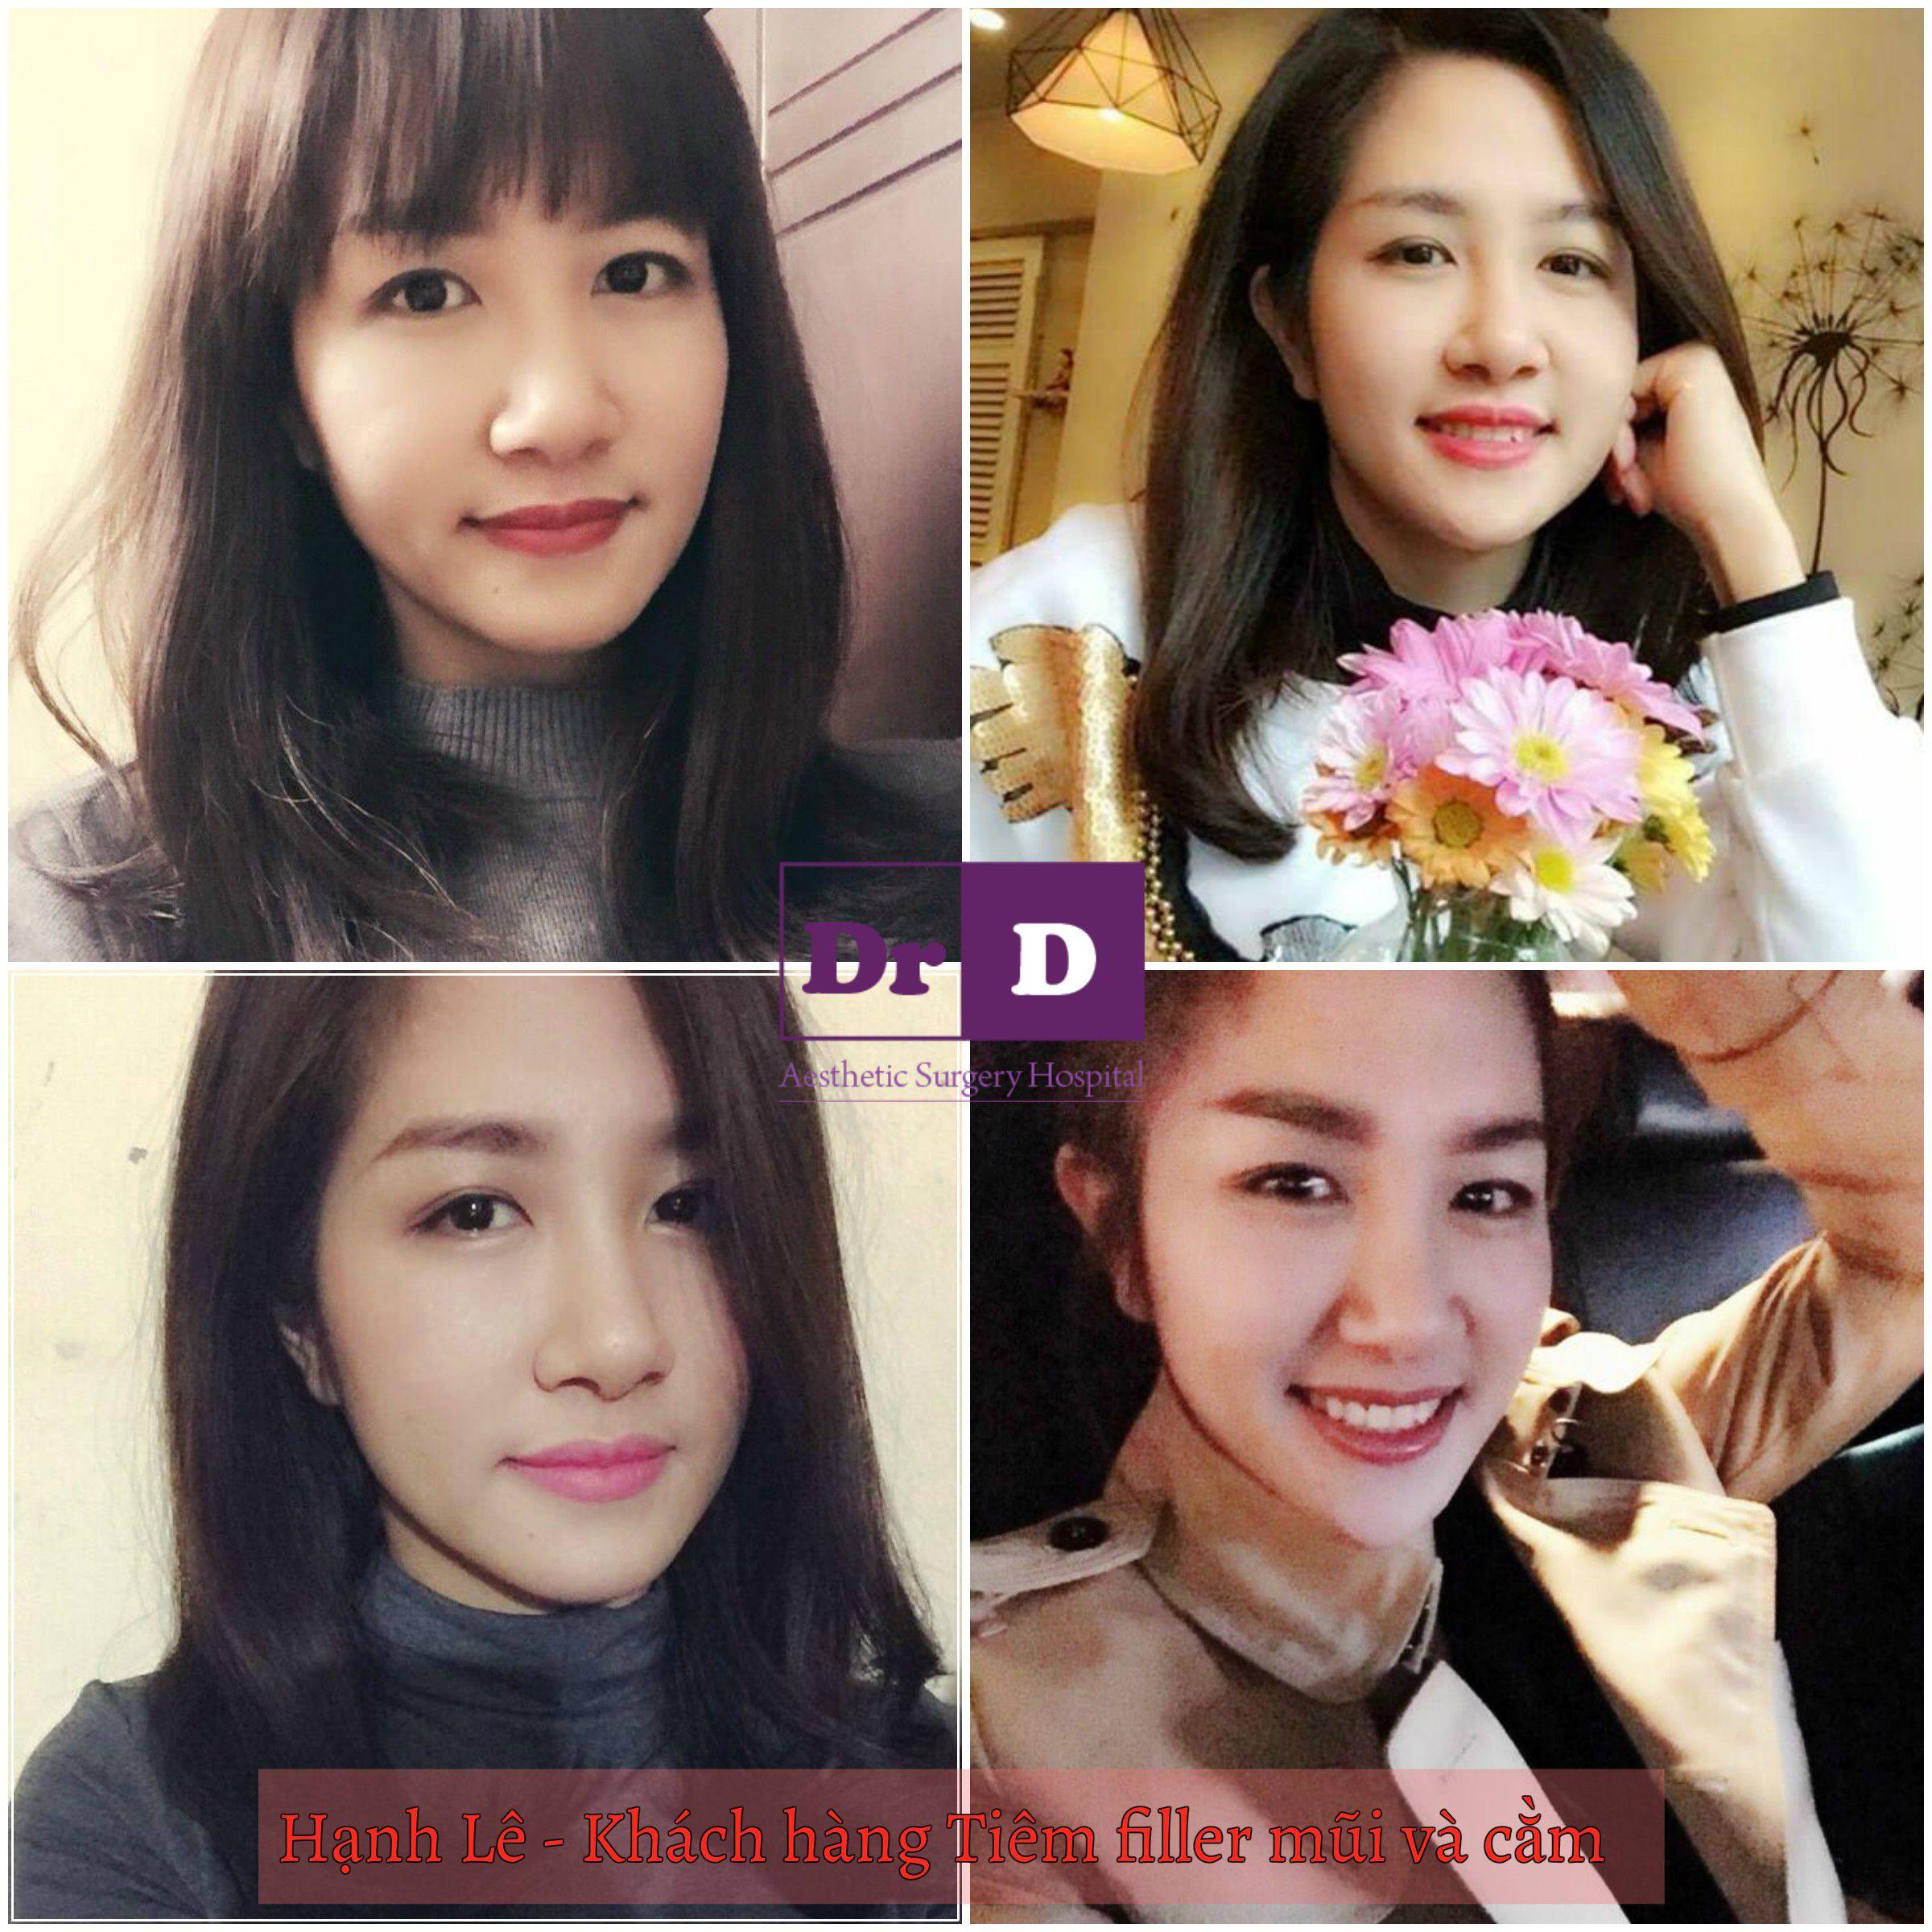 muon-selfie-dep-thi-mat-phai-dep (3)